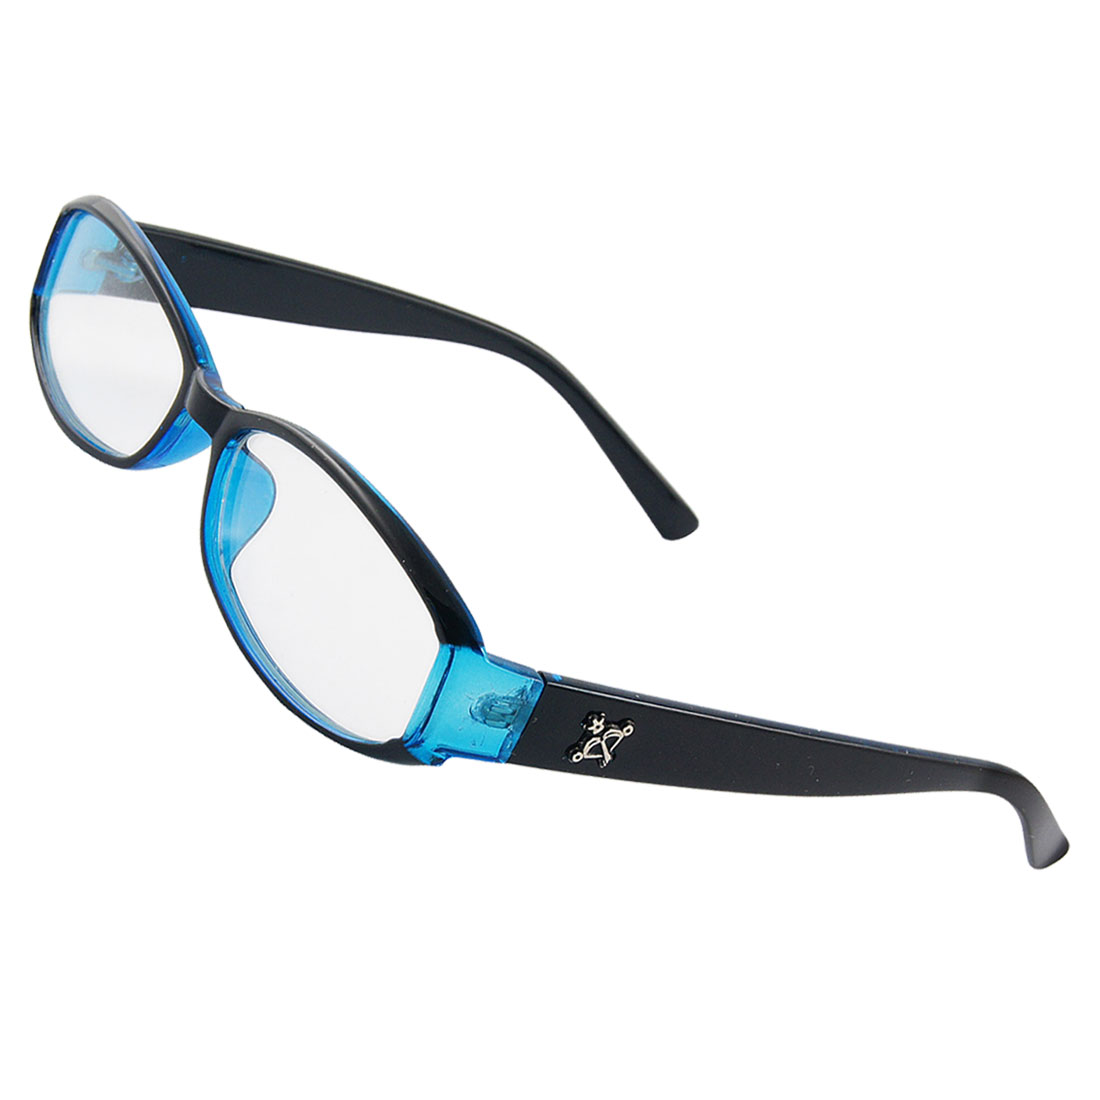 4c822998e5a Glasses   Eyewear in Canada